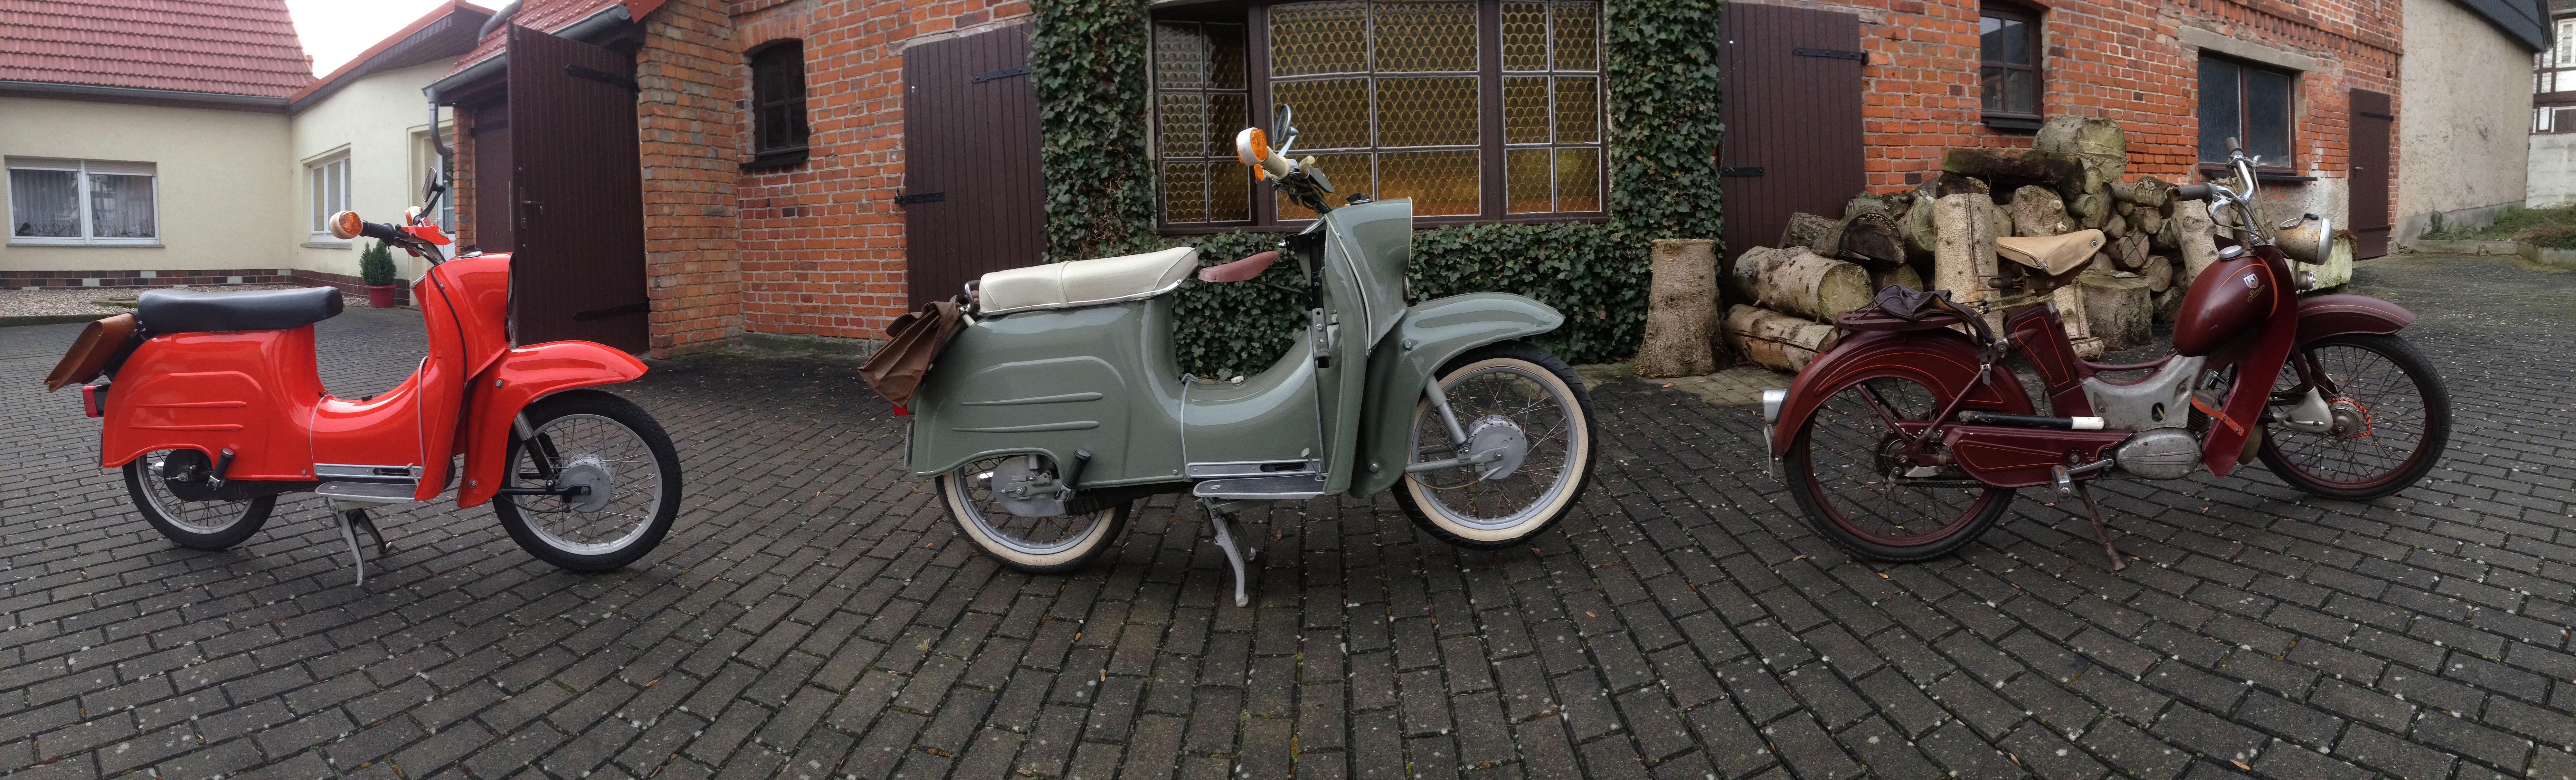 simson-moped